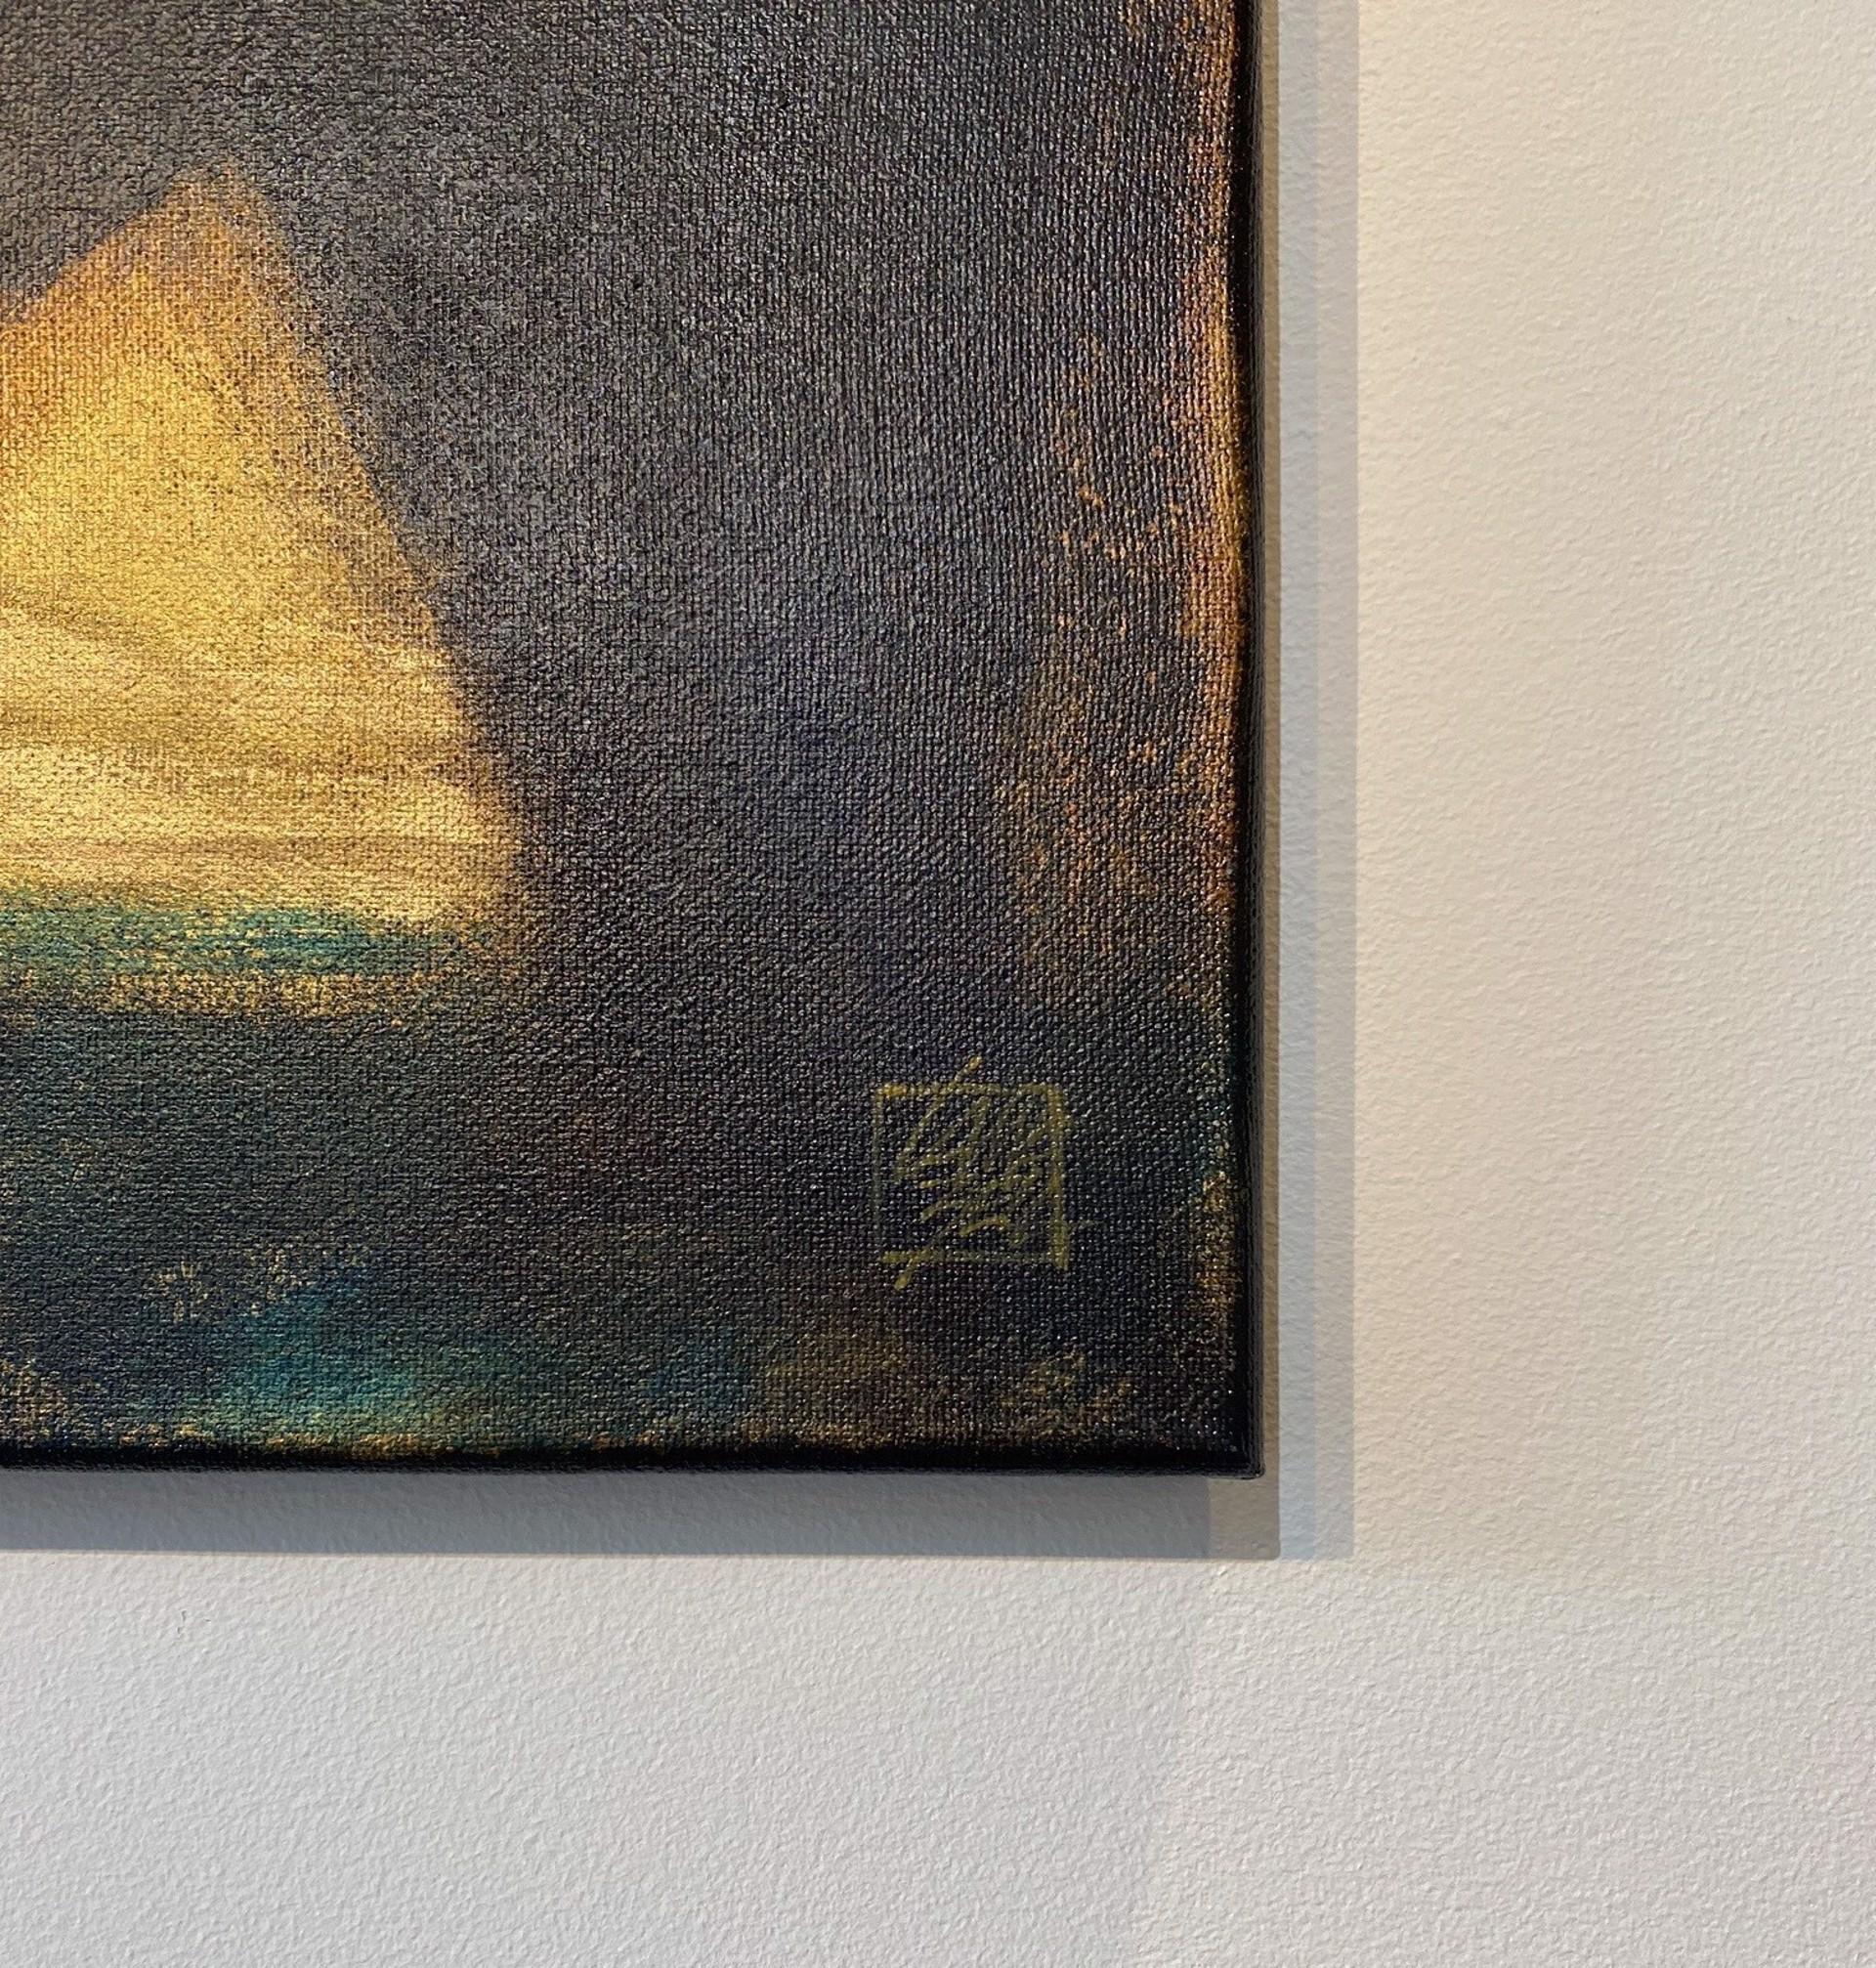 Ken Campbell - Ursus & Spawners 2  by Historical Art